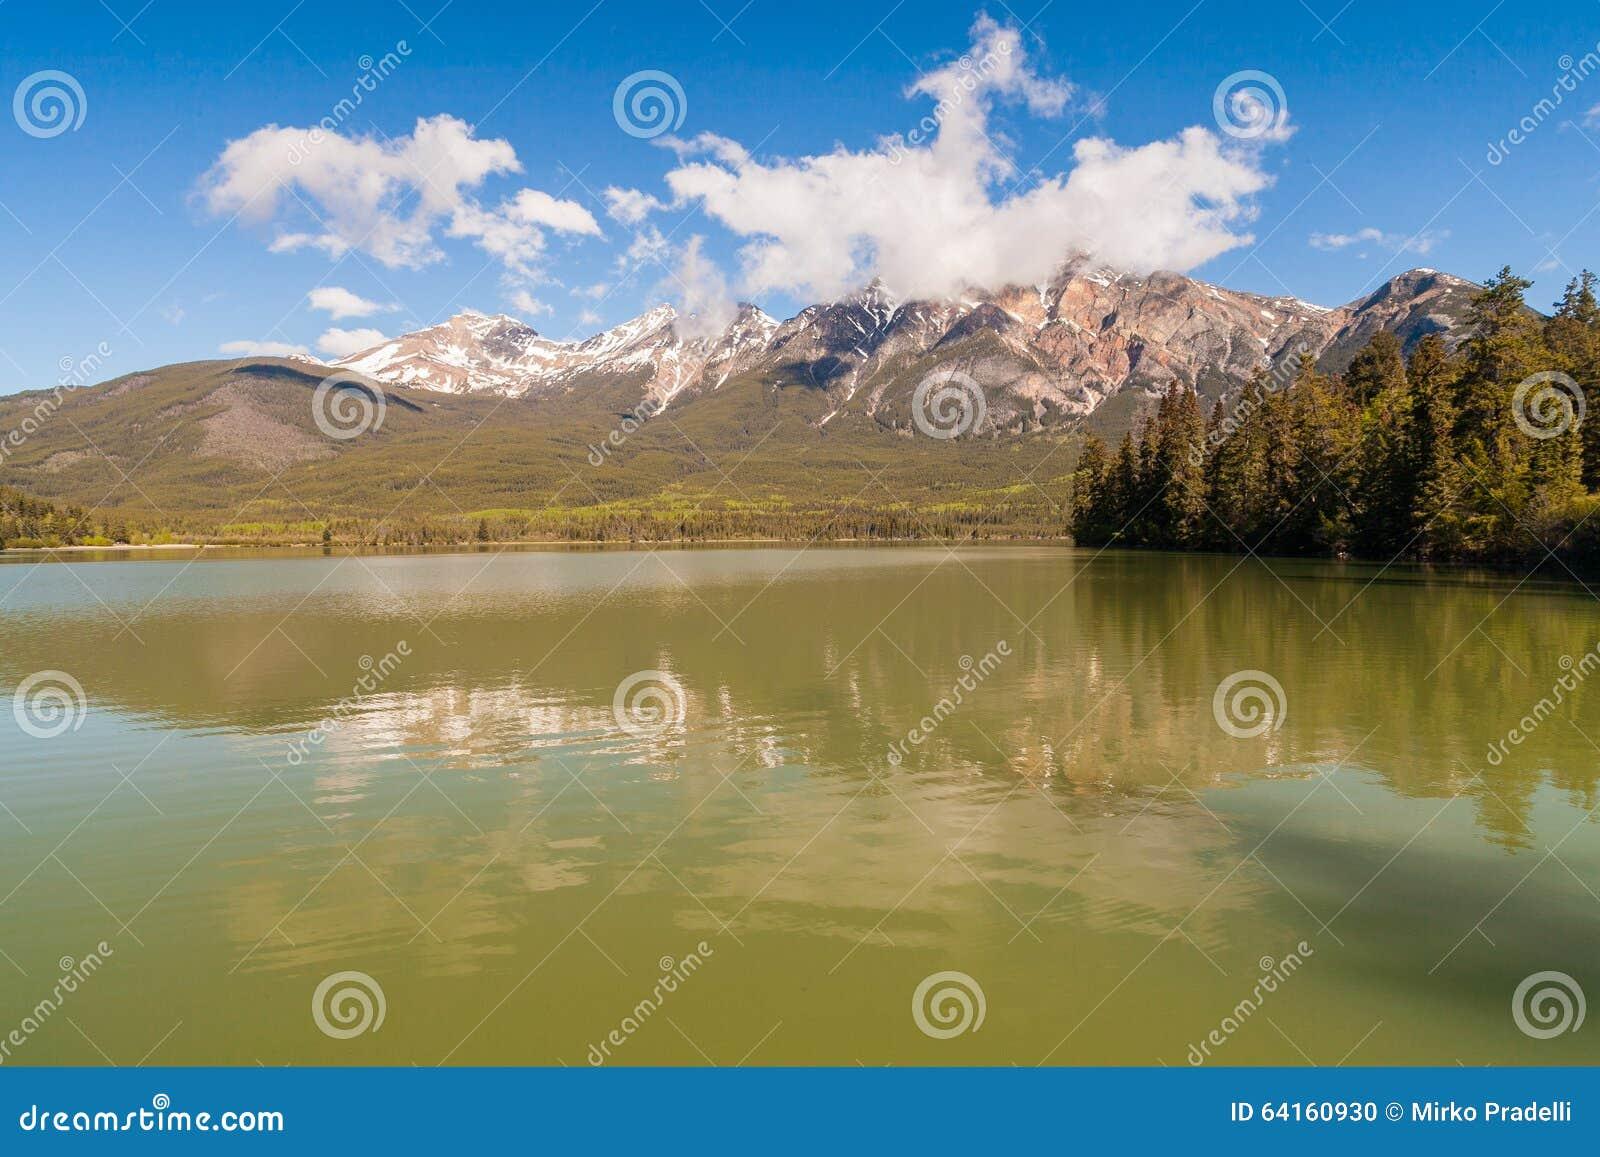 Озеро Патриция, Альберта, Канада